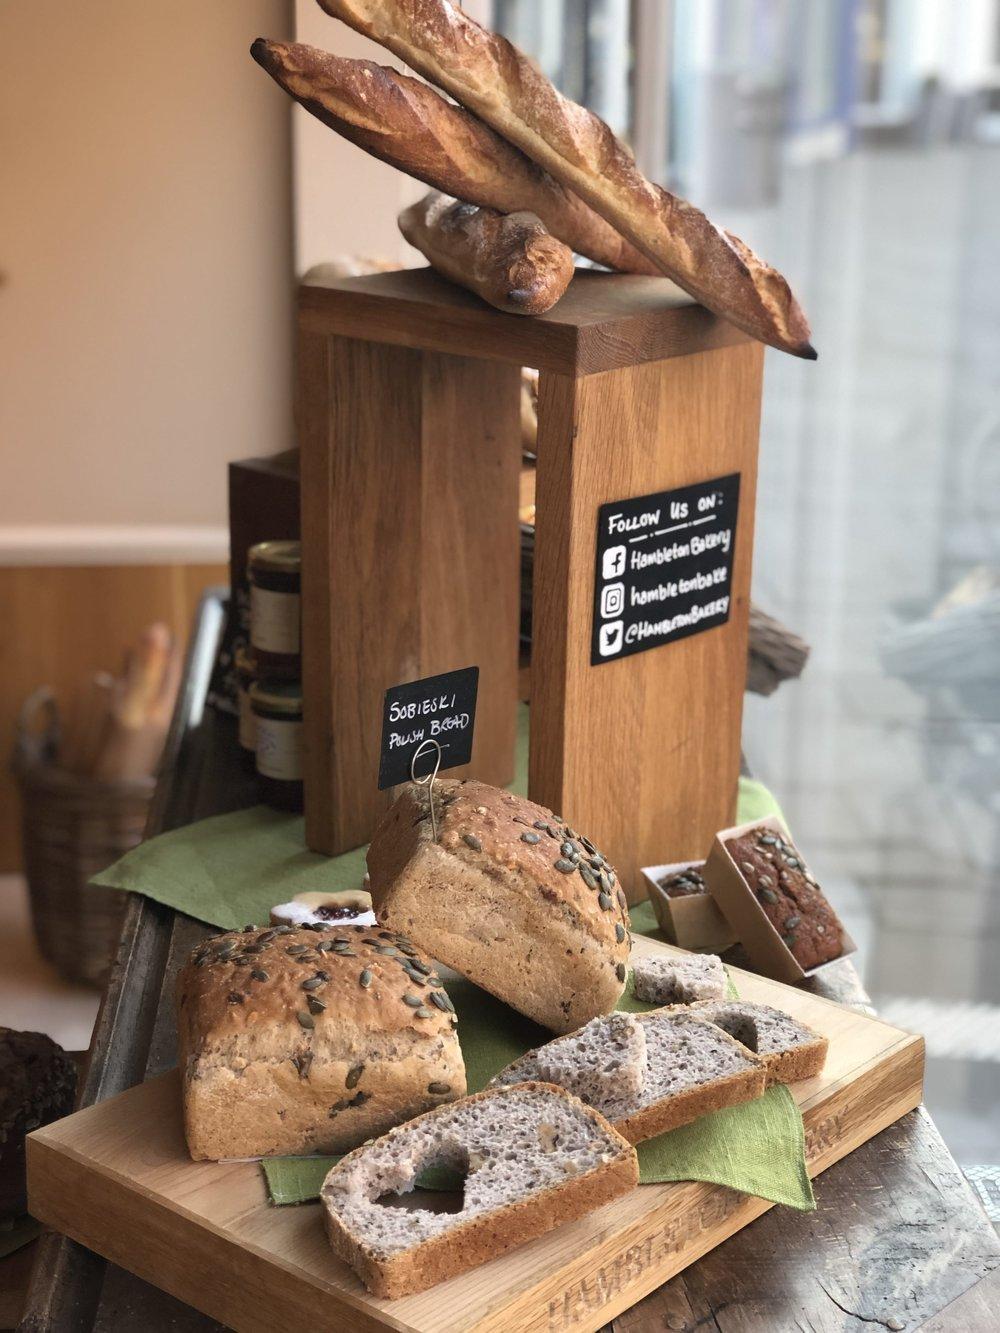 Hambleton_bakery_real_bread_week_sobieski.jpeg